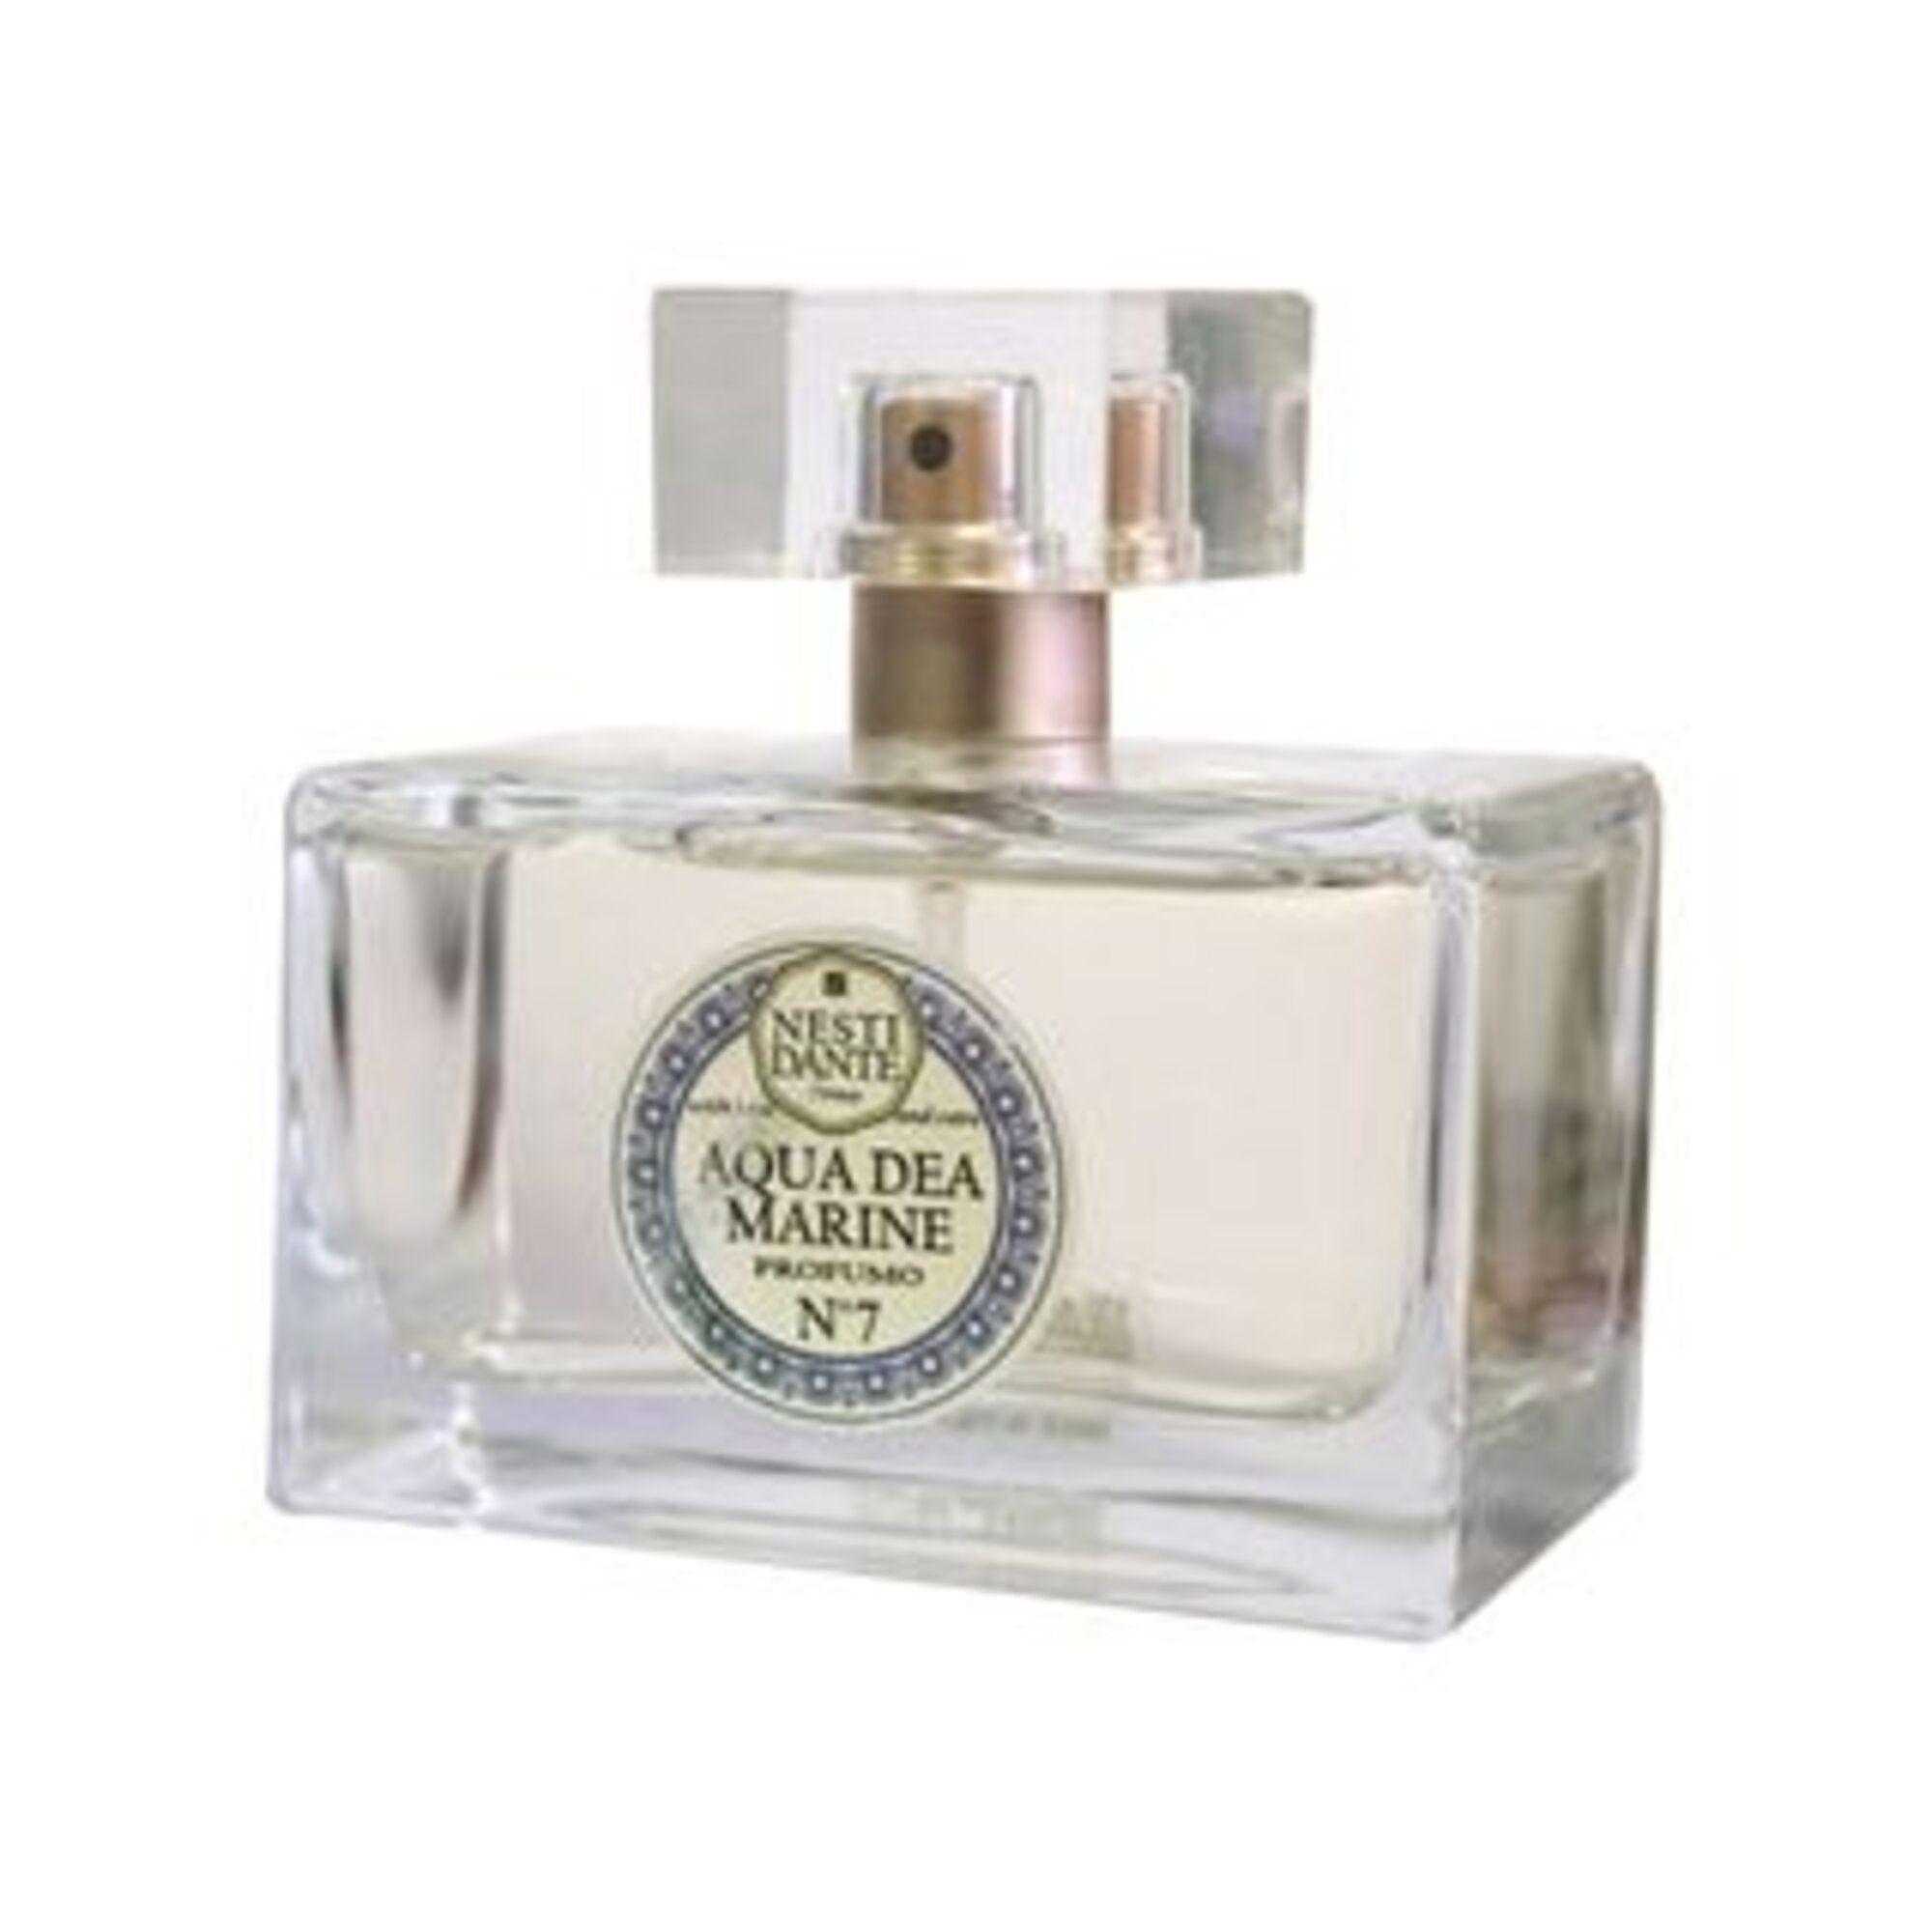 Perfume Aqua Dea Marine 100mL Nesti Dante